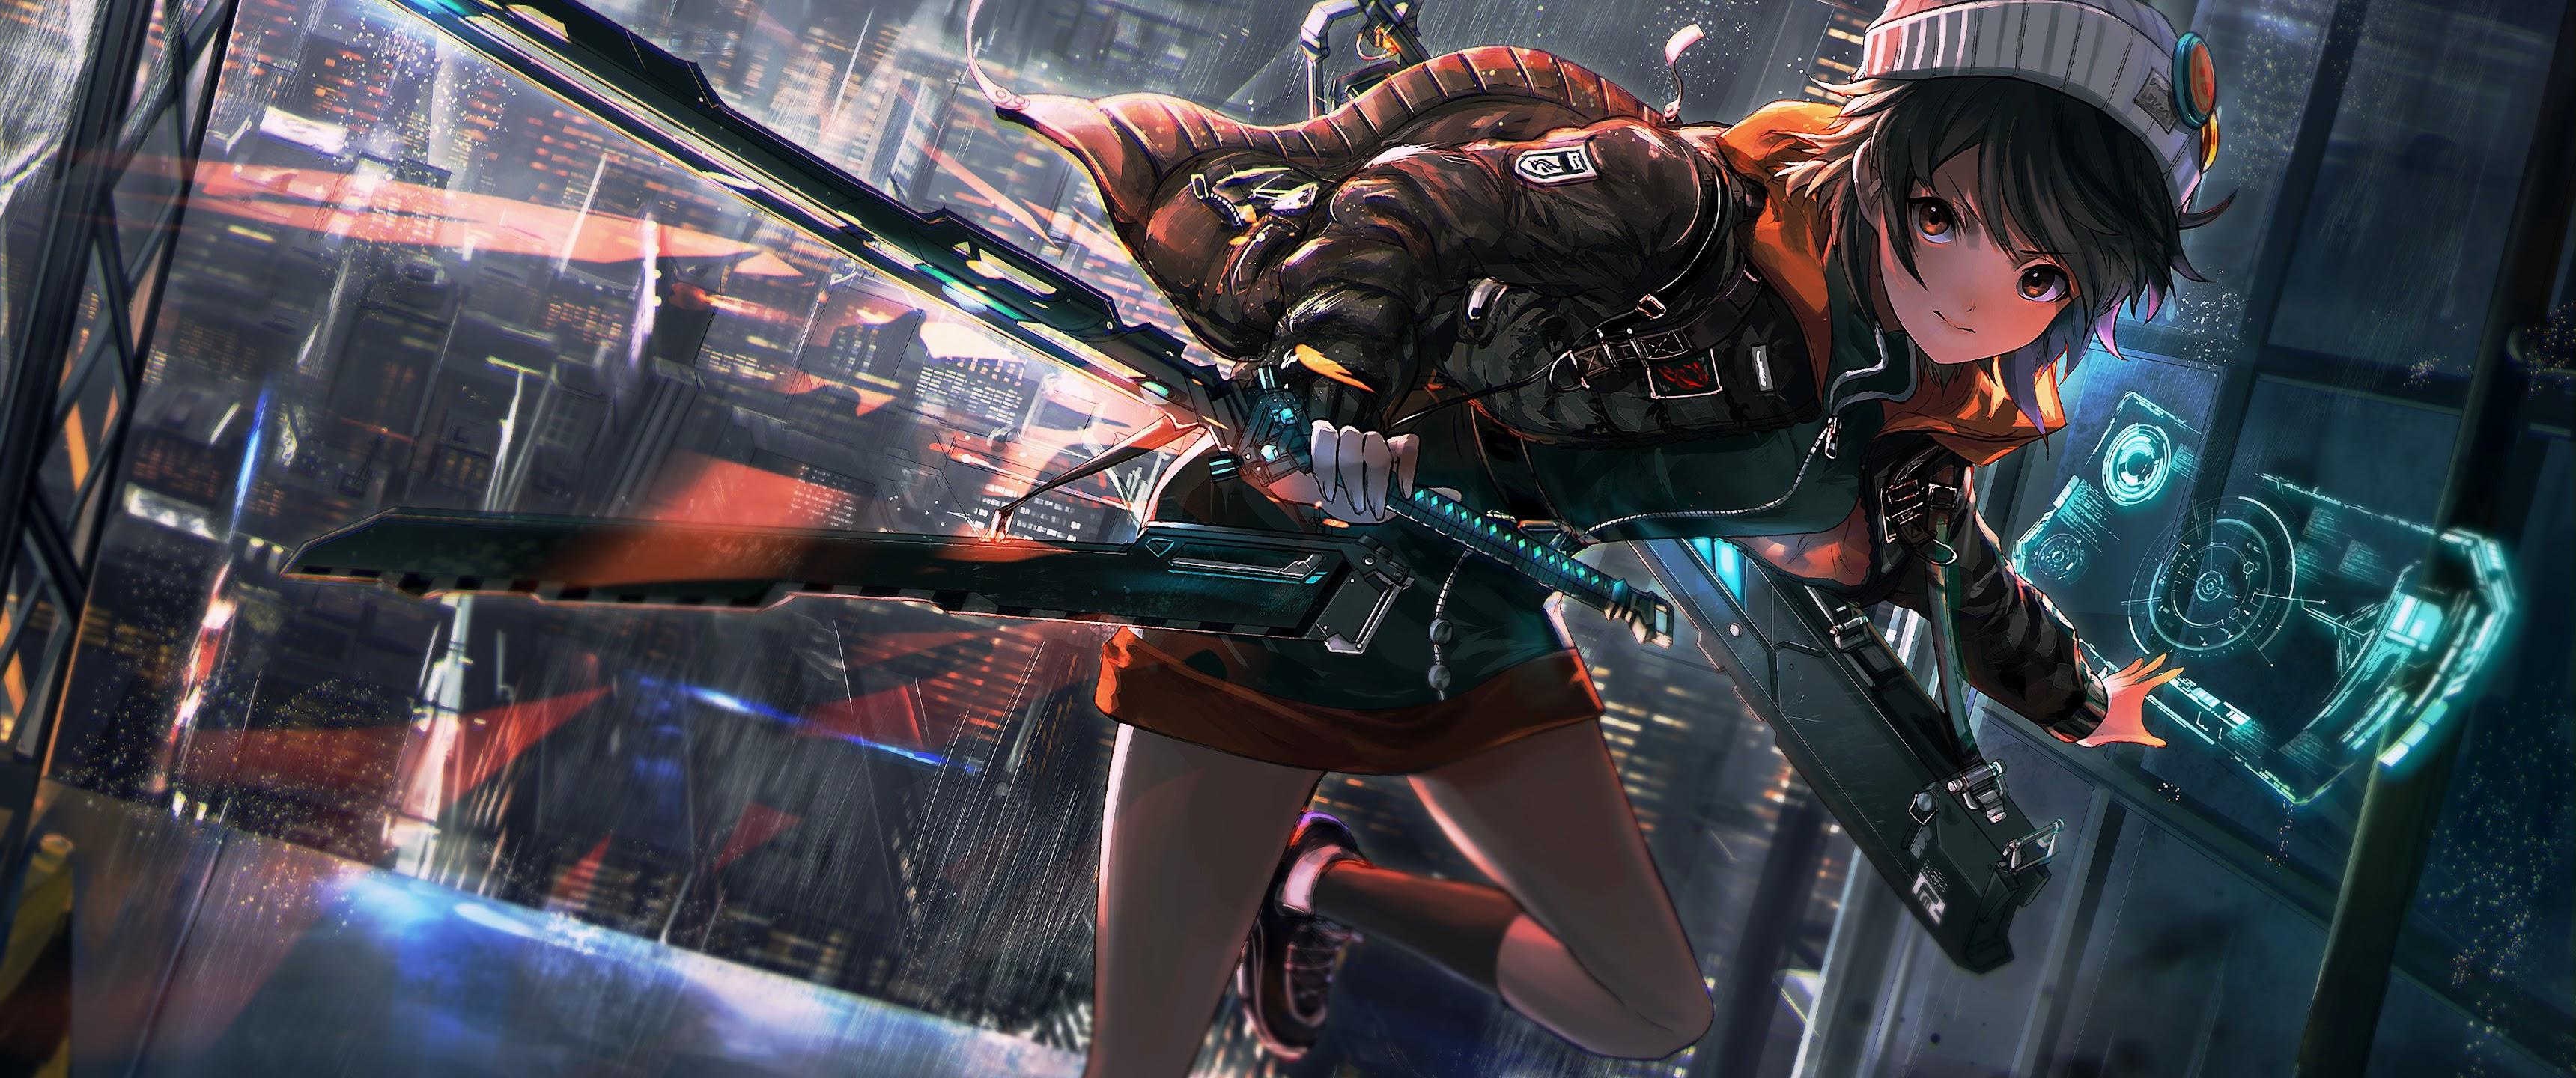 Epic Girl With Gun Wallpaper Anime Girl Sci Fi Katana 4k 3840x2160 27 Wallpaper